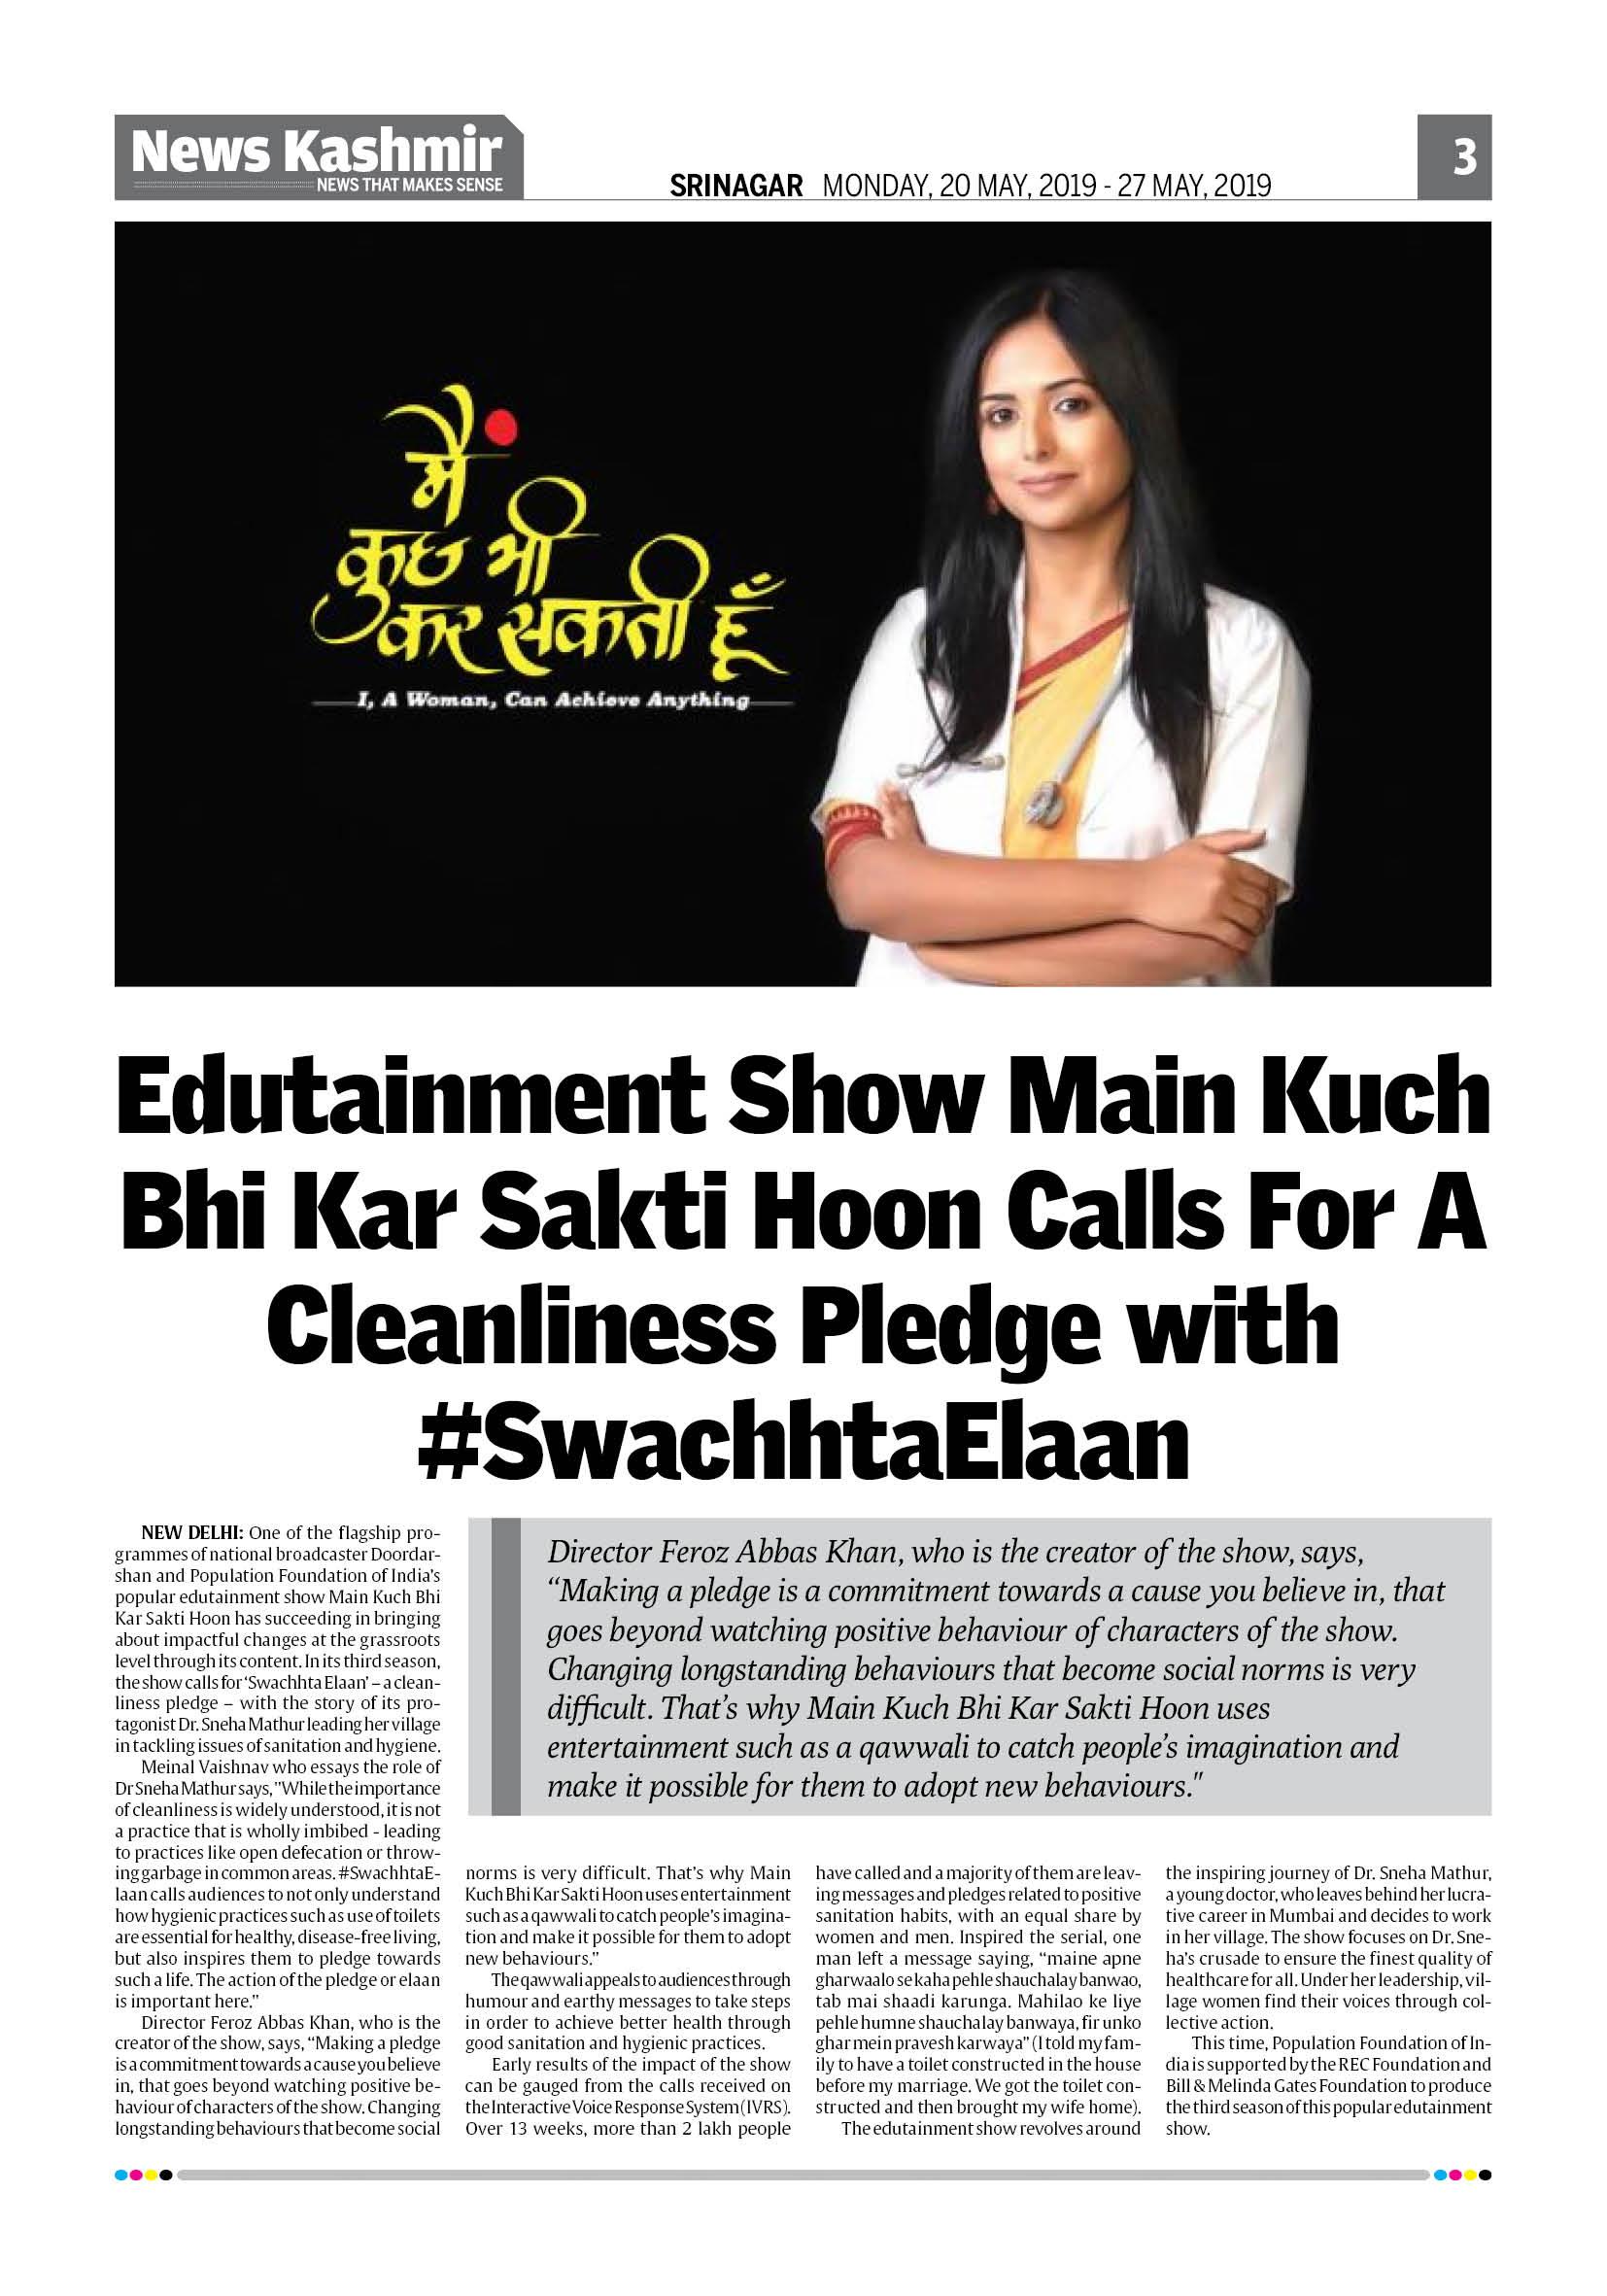 Edutainment Show Main Kuch Bhi Kar Sakti Hoon Calls For A Cleanliness Pledge with #SwachhtaElaan